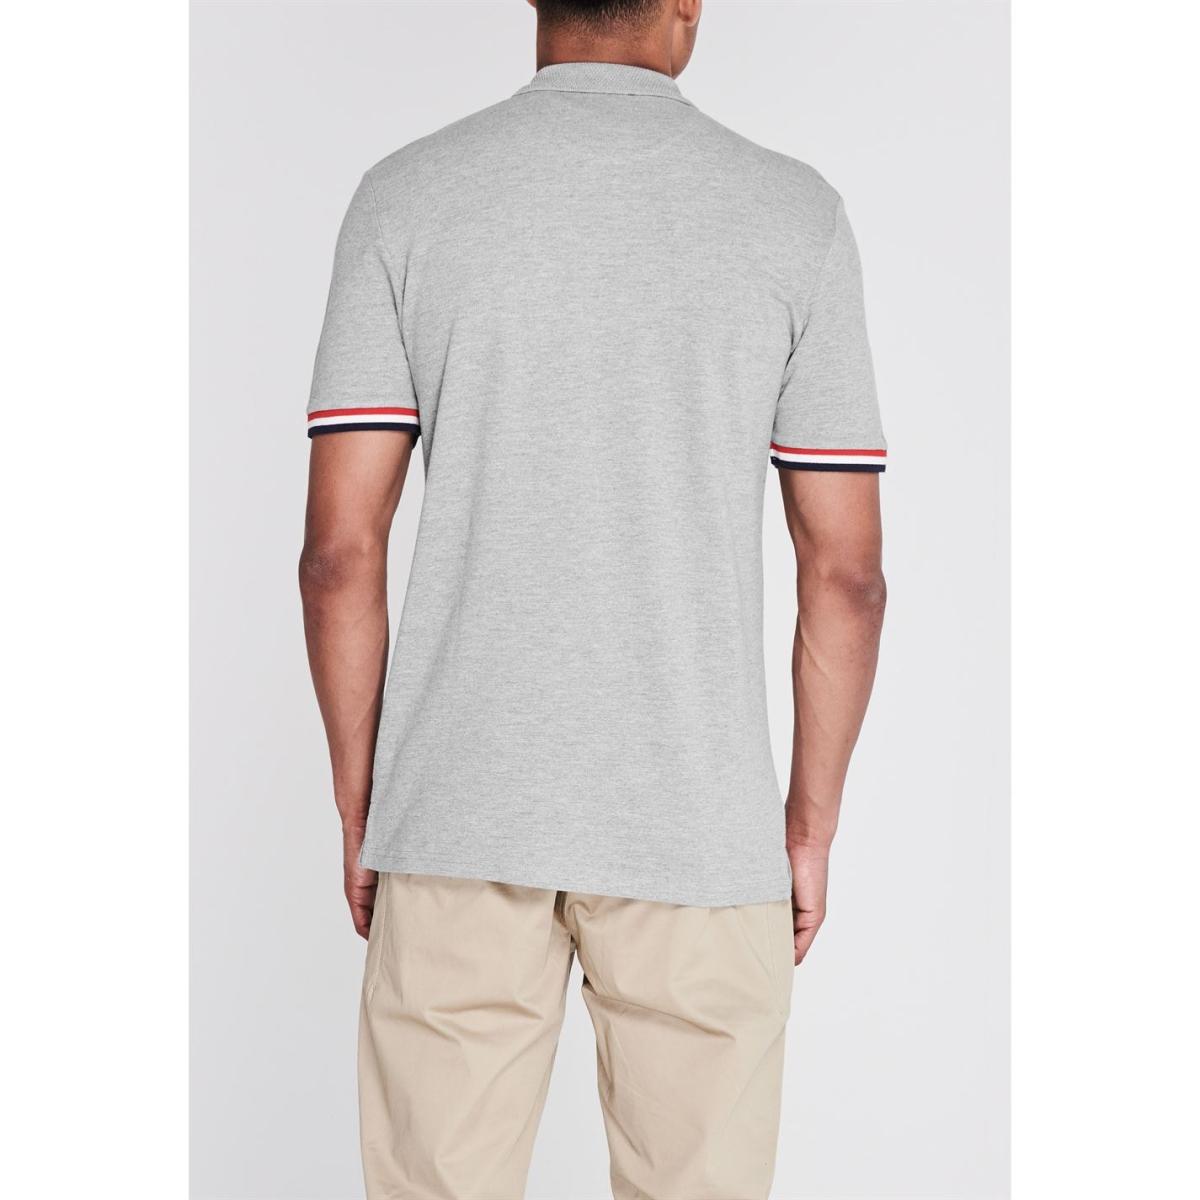 Jack And Jones Poloshirt T-Shirt Polohemd Herren 2237